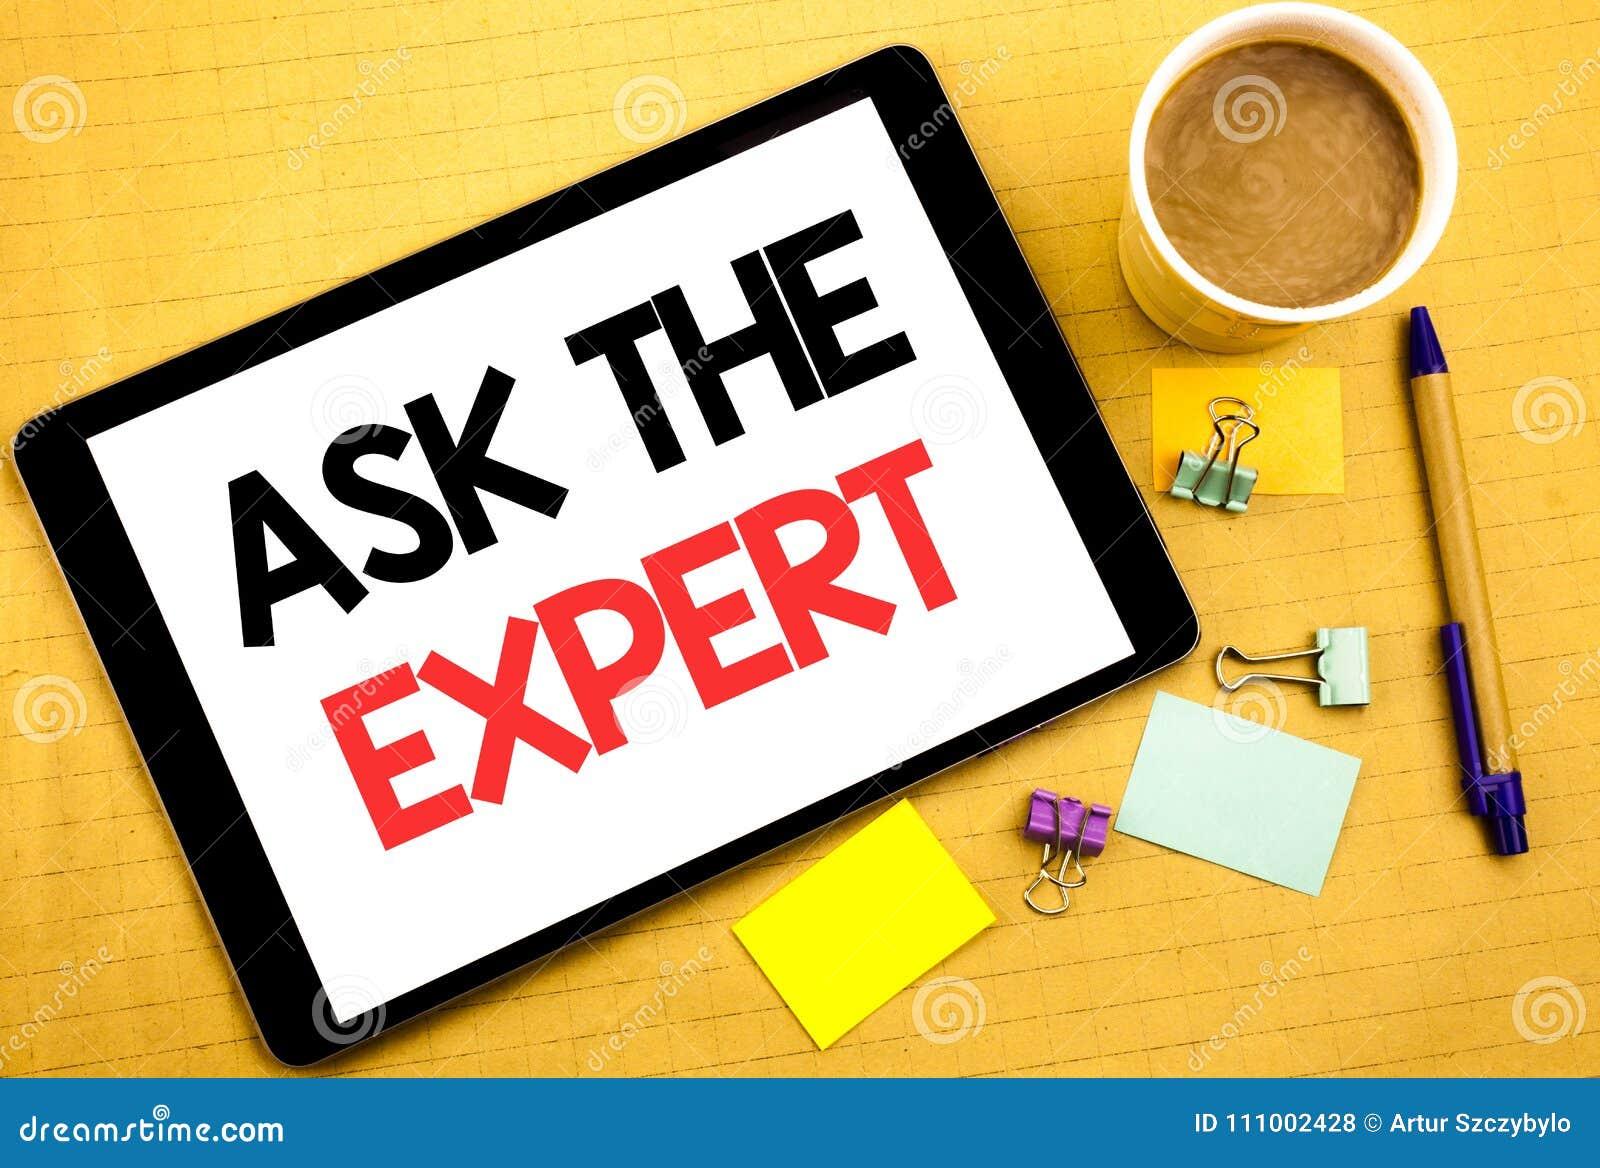 Writing expert help popular school presentation sample